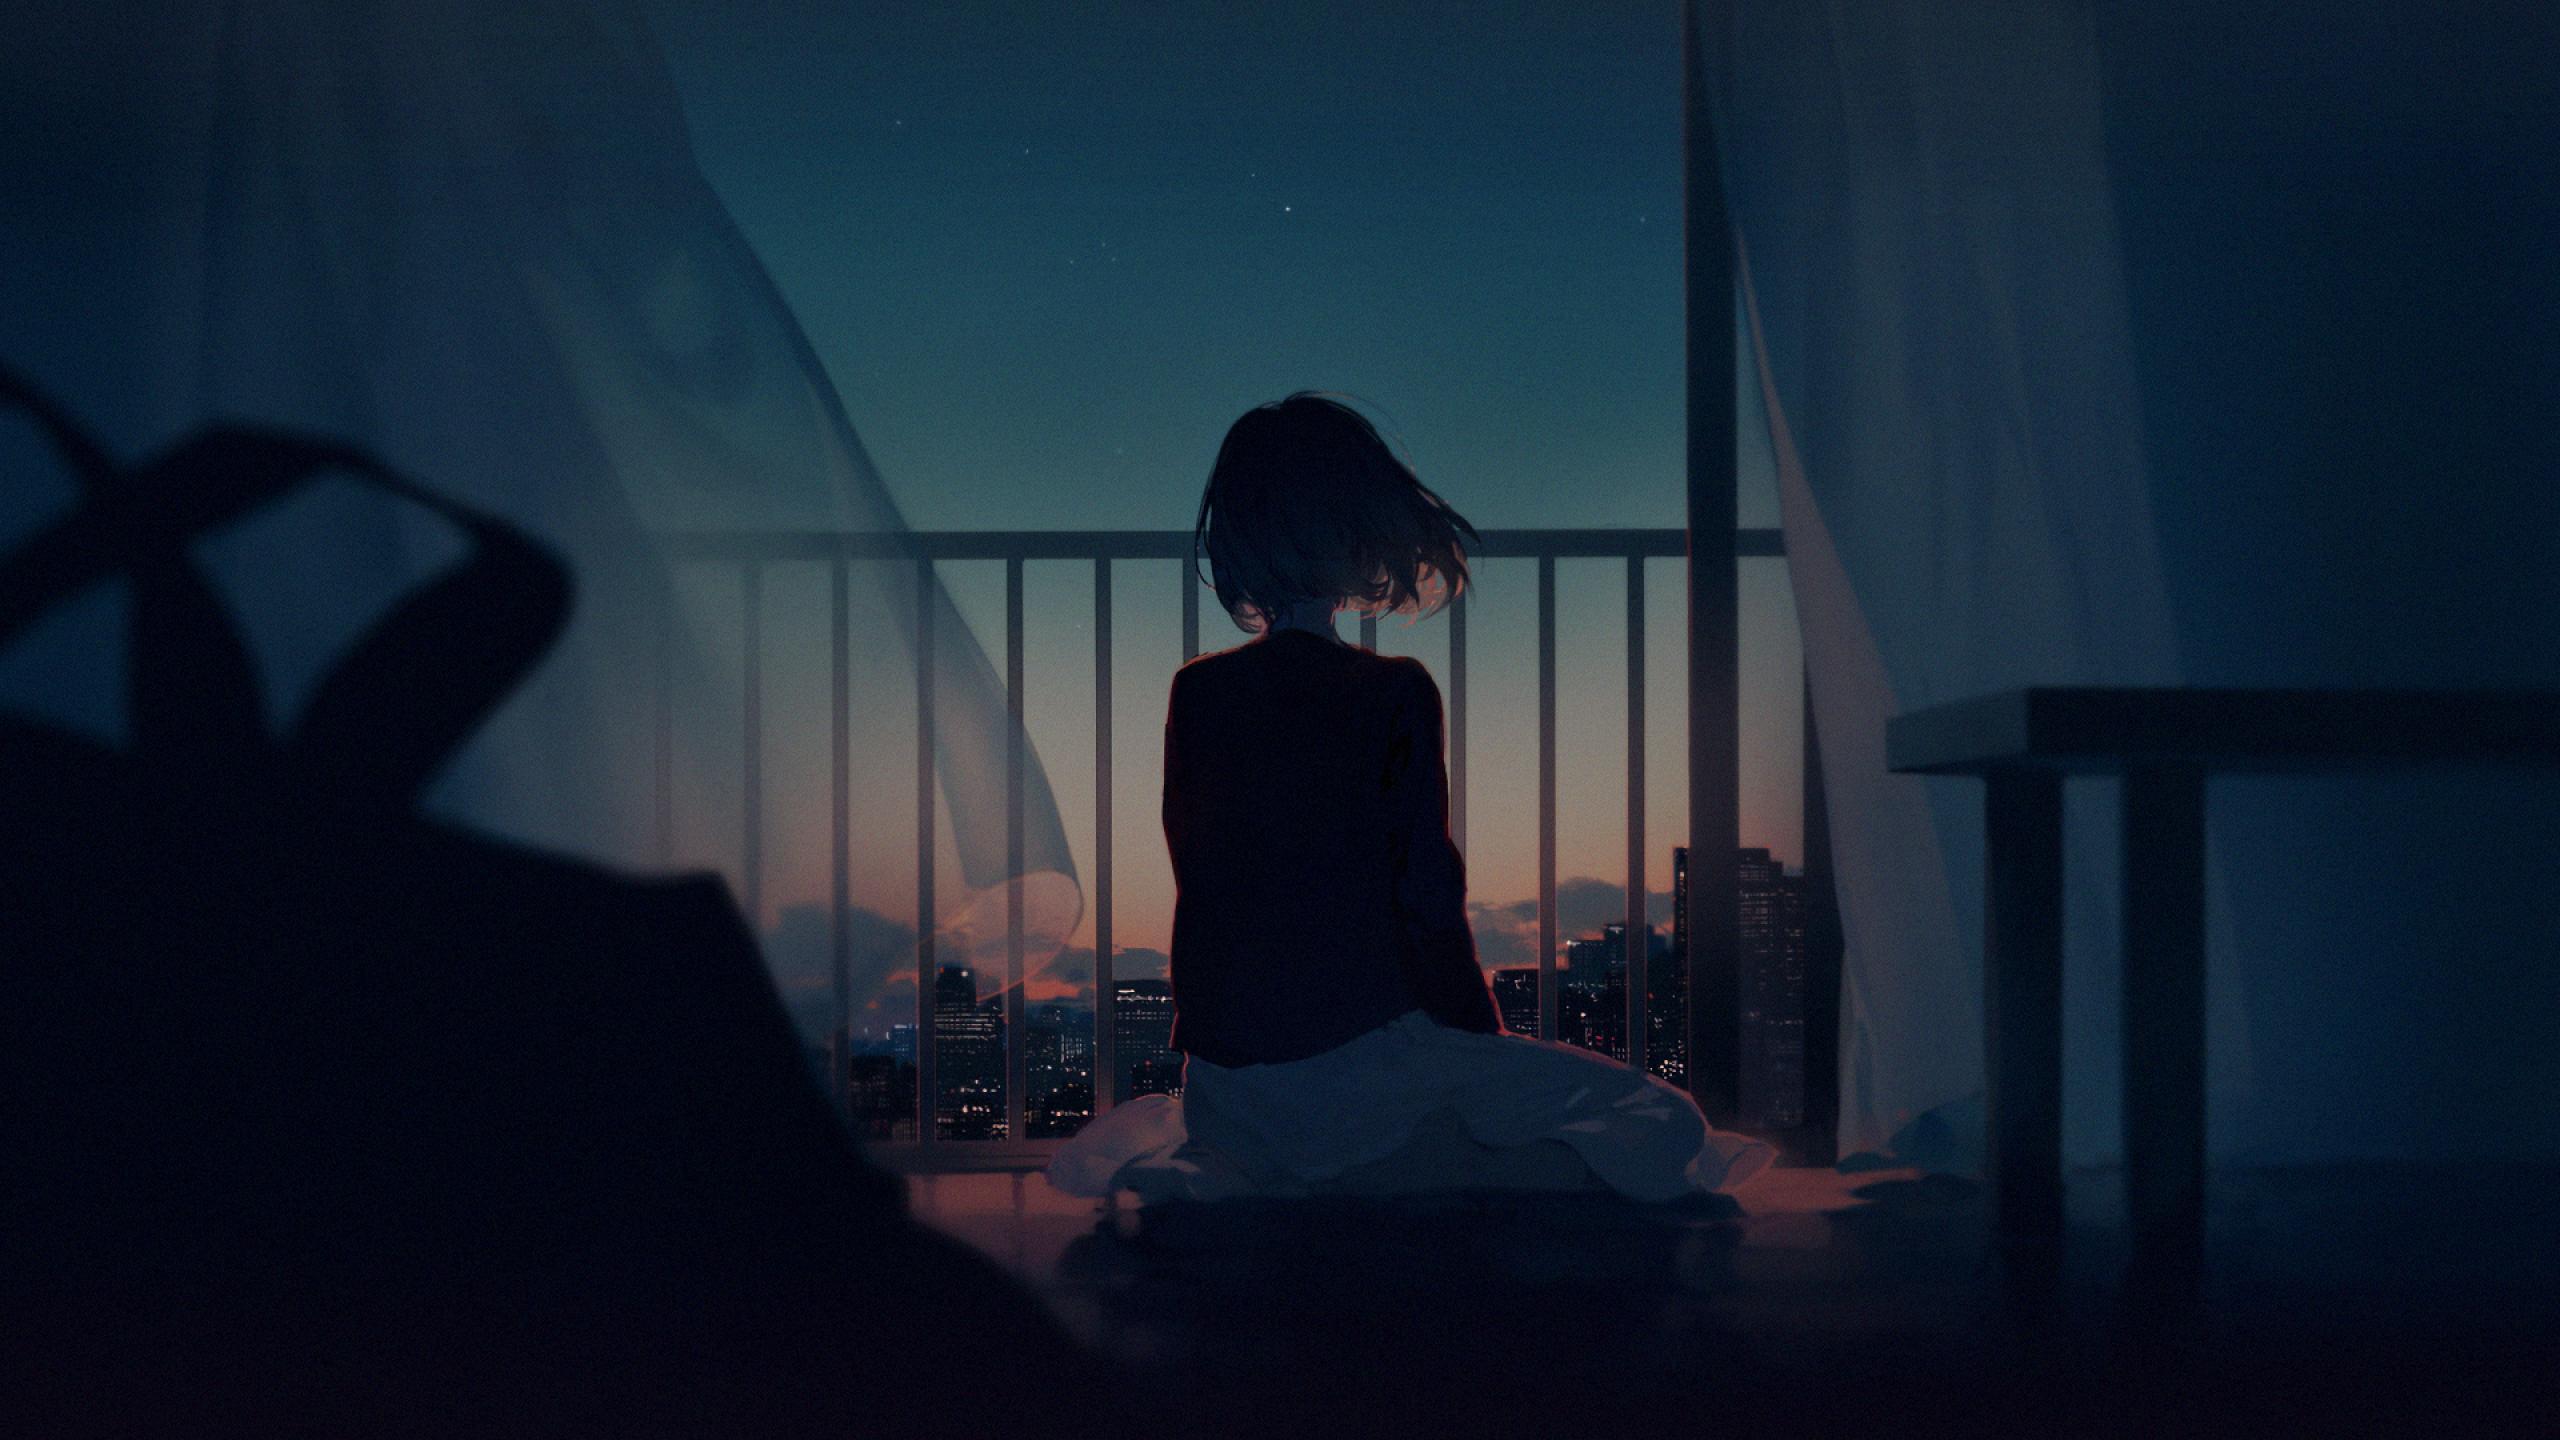 Alone Anime Sad Girl - HD Wallpaper